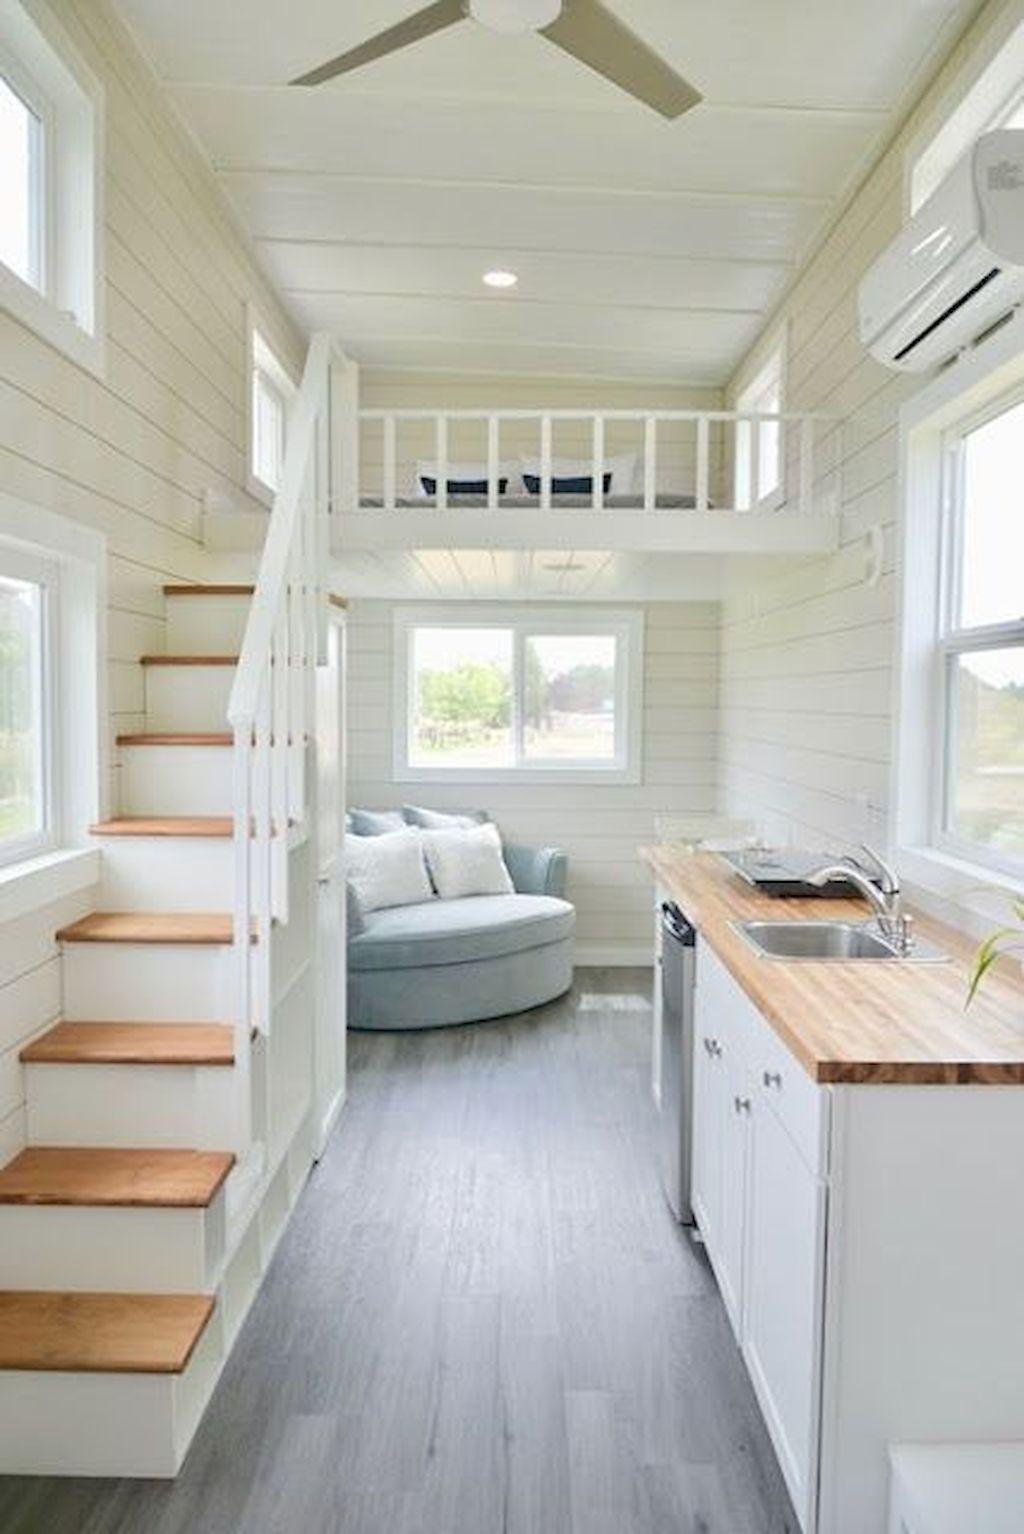 70 Cool Tiny House Interior Design Ideas Tiny House Interior